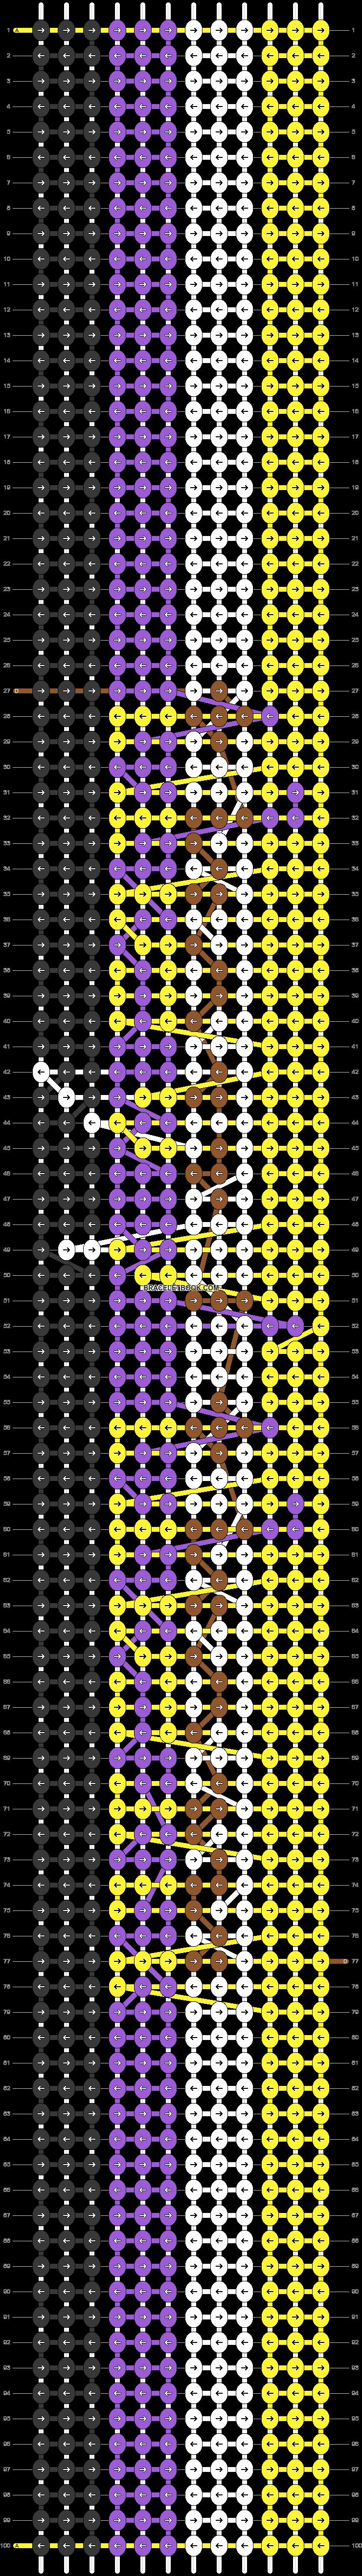 Alpha pattern #44485 pattern